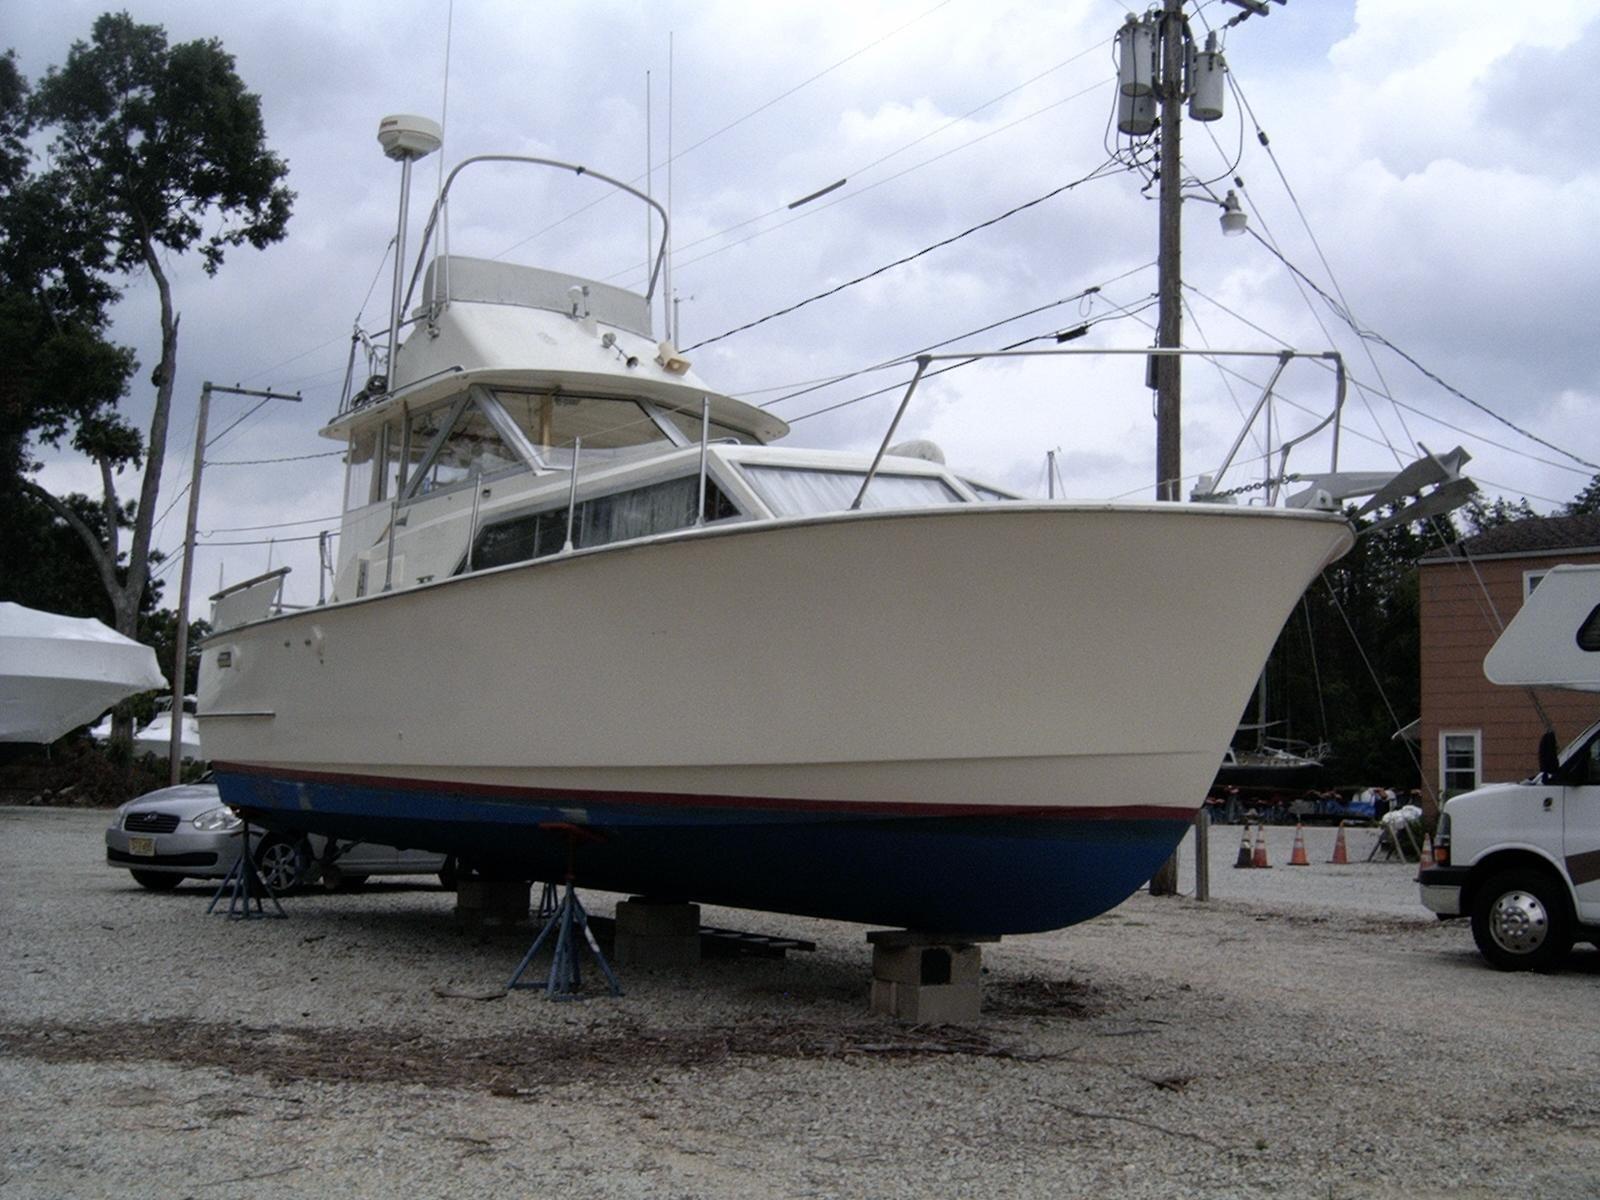 1968 Hatteras Flybridge Cabin Cruiser Power Boat For Sale - www.yachtworld.com